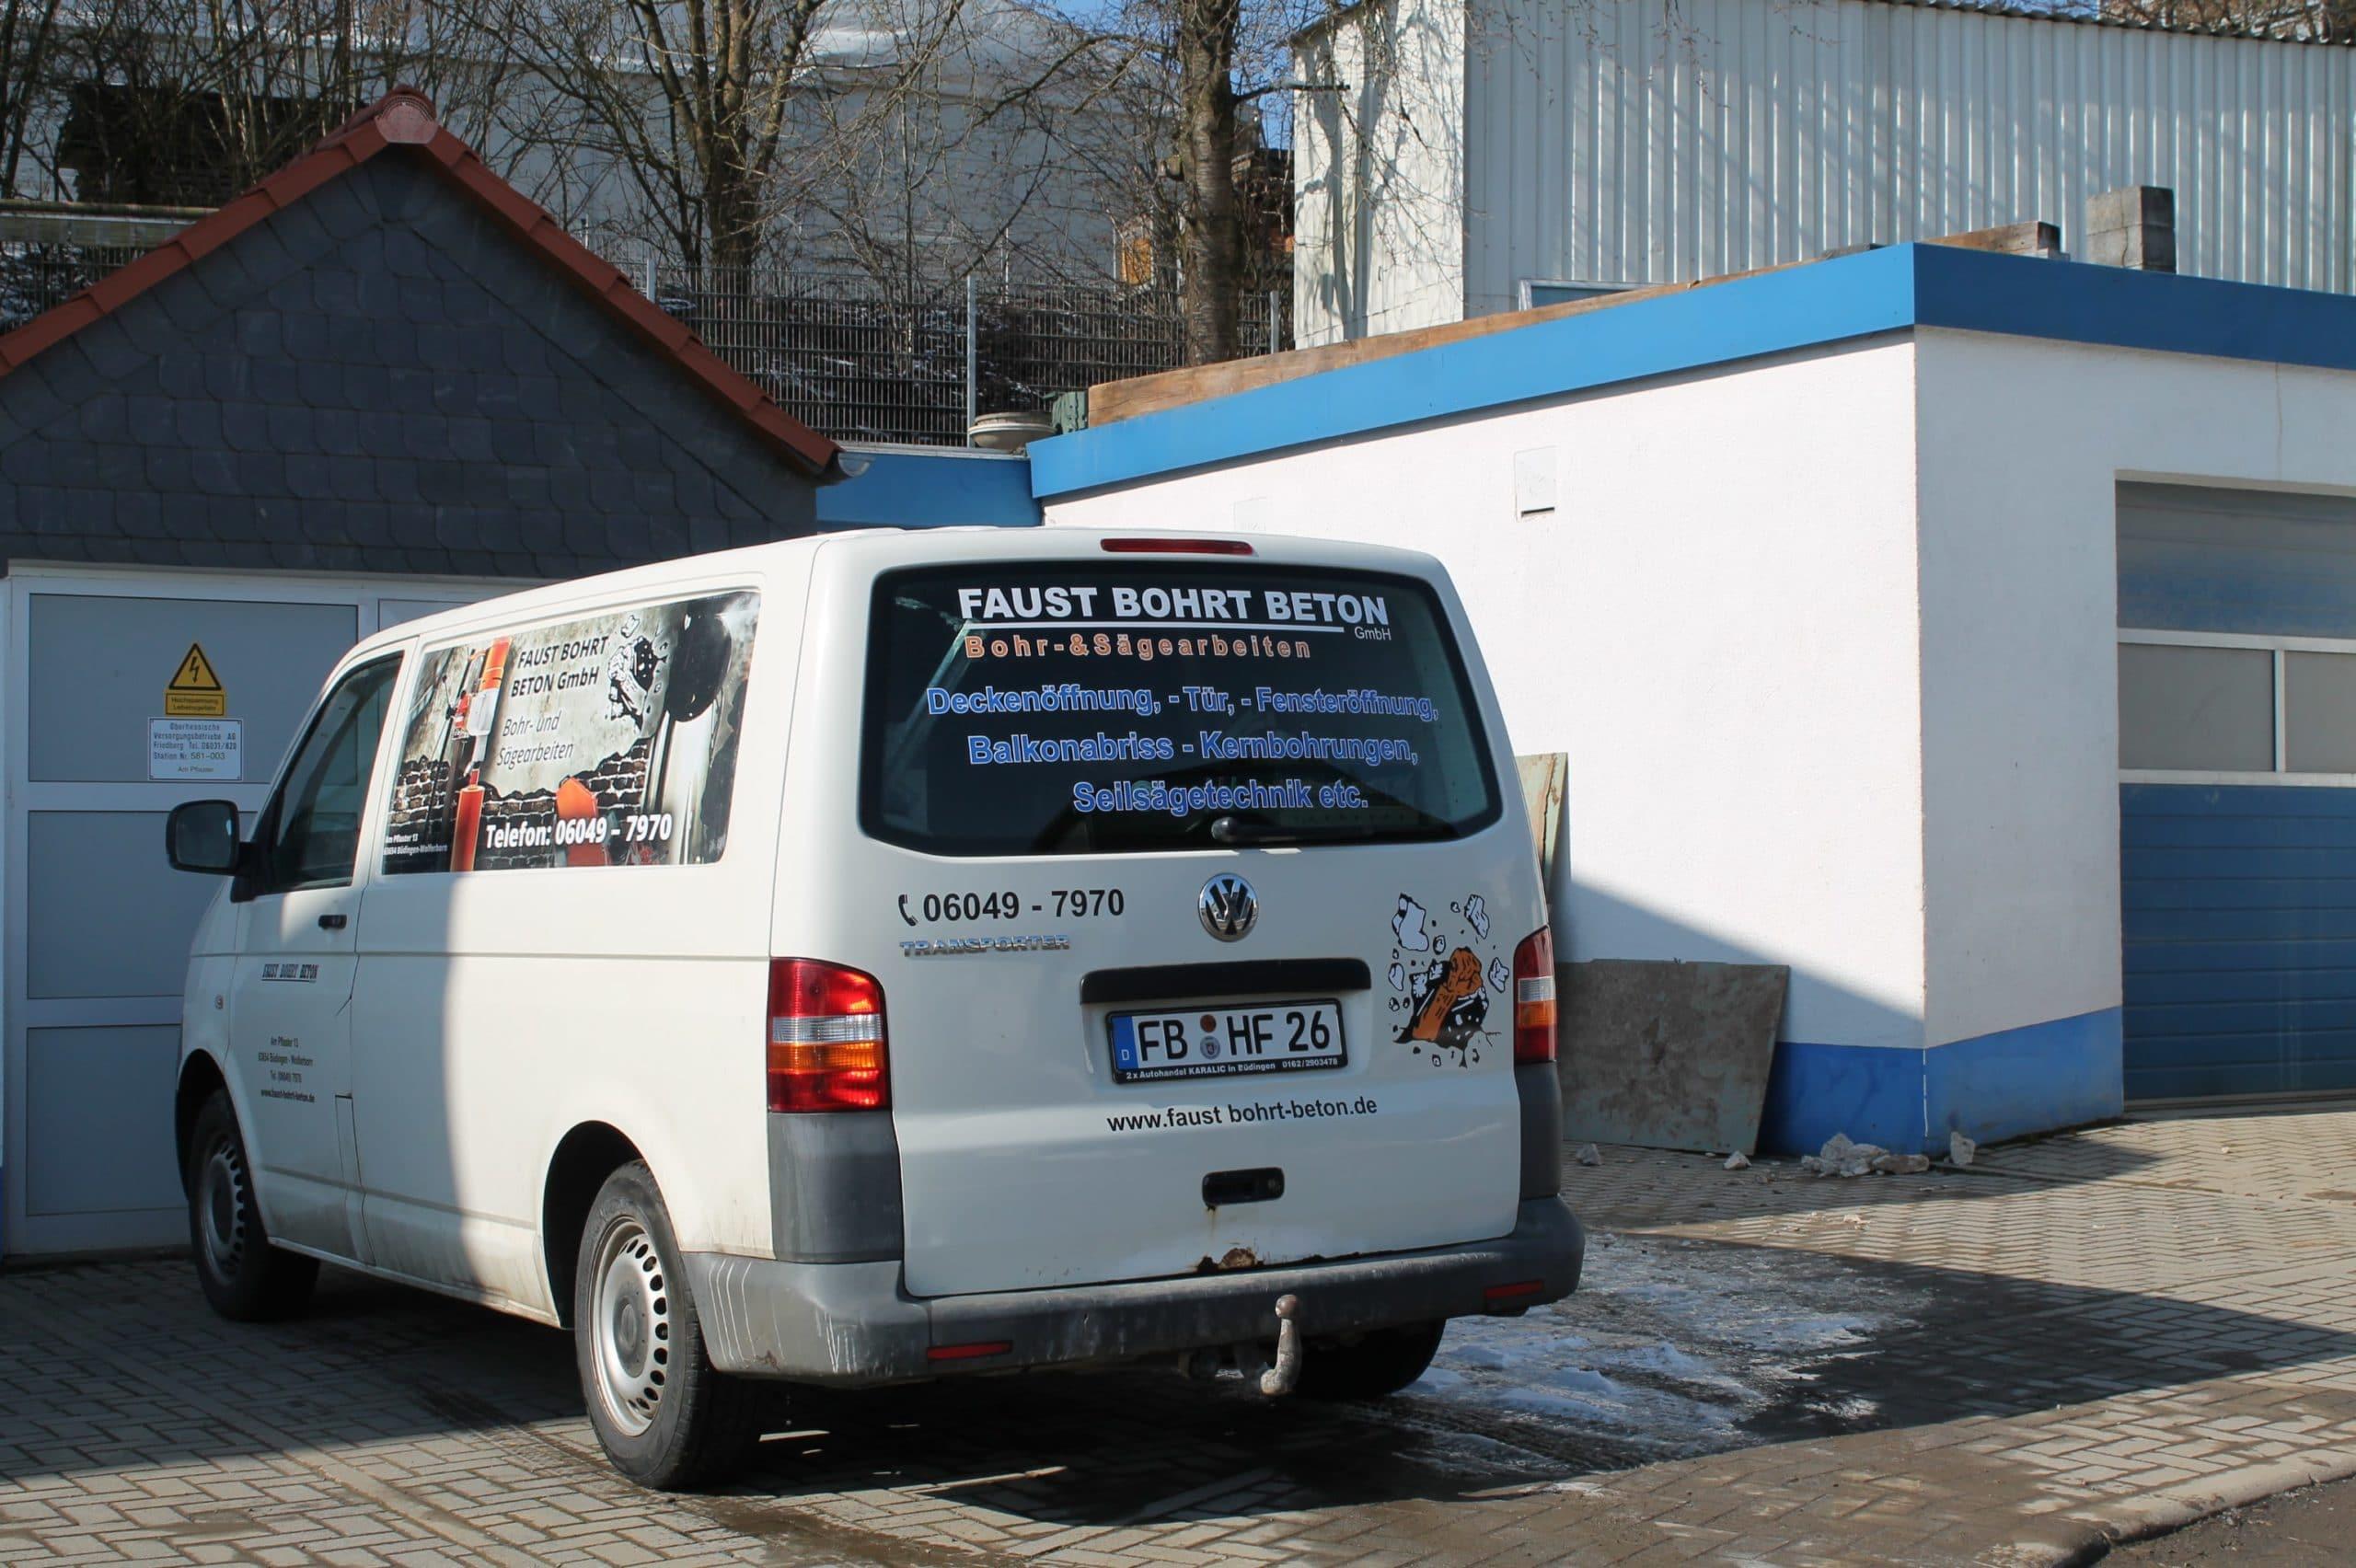 Faust bohrt Beton Fuhrpark 5